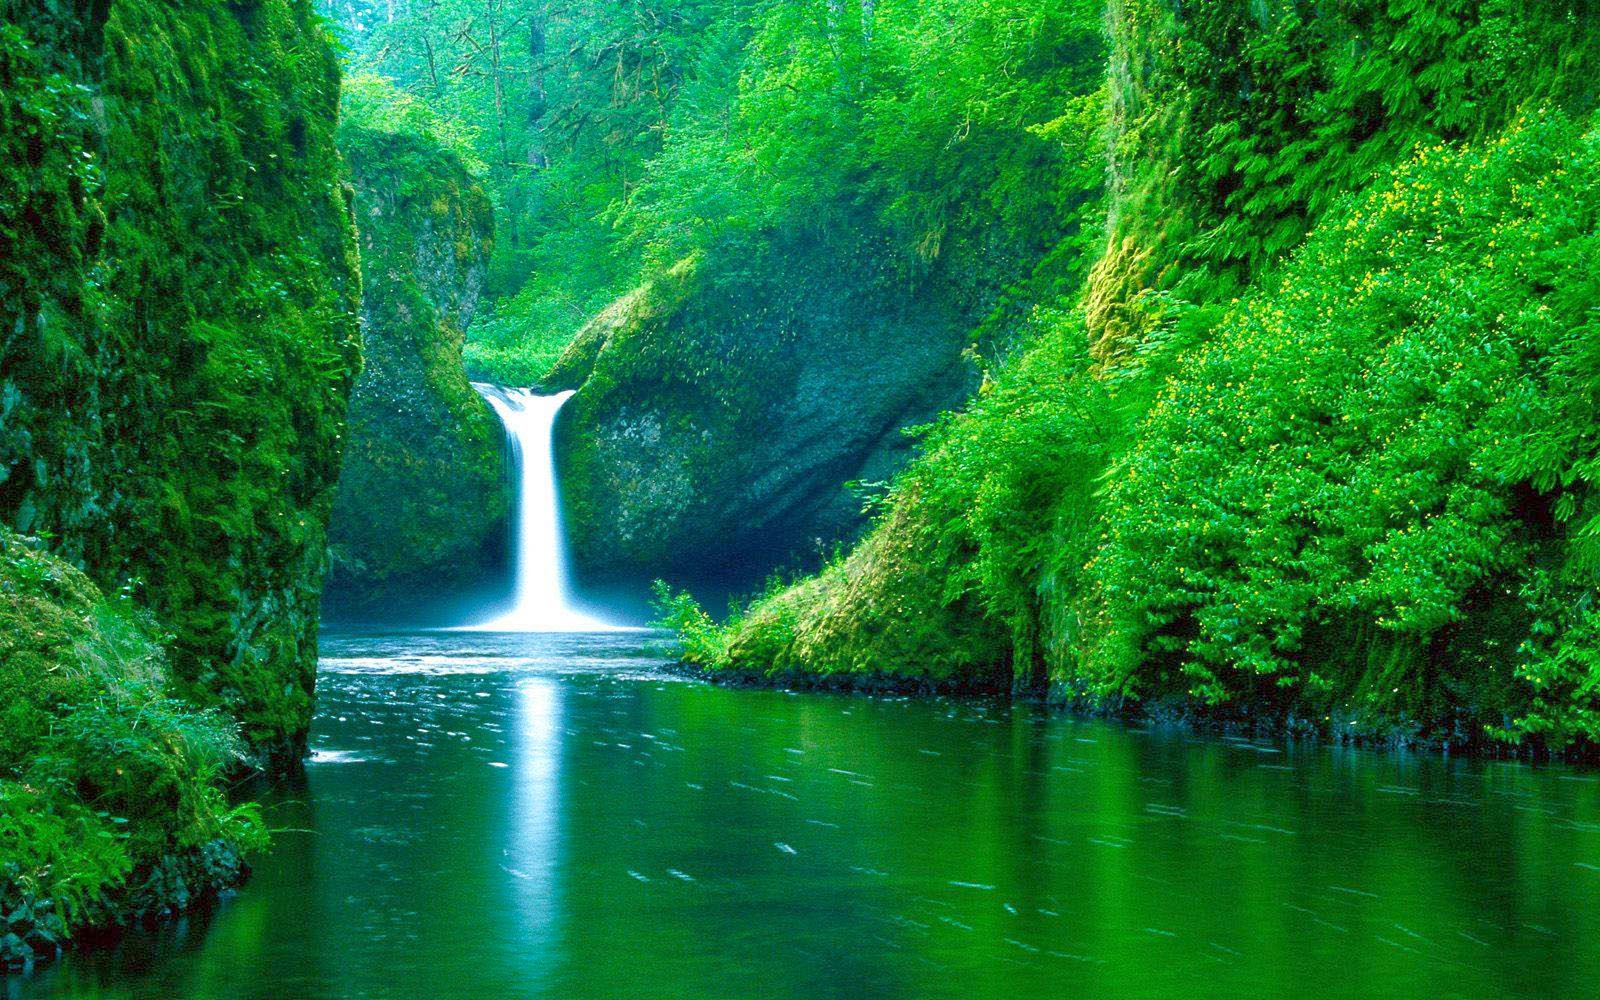 Wallpapers water falls wallpapers - Aquatic wallpaper ...